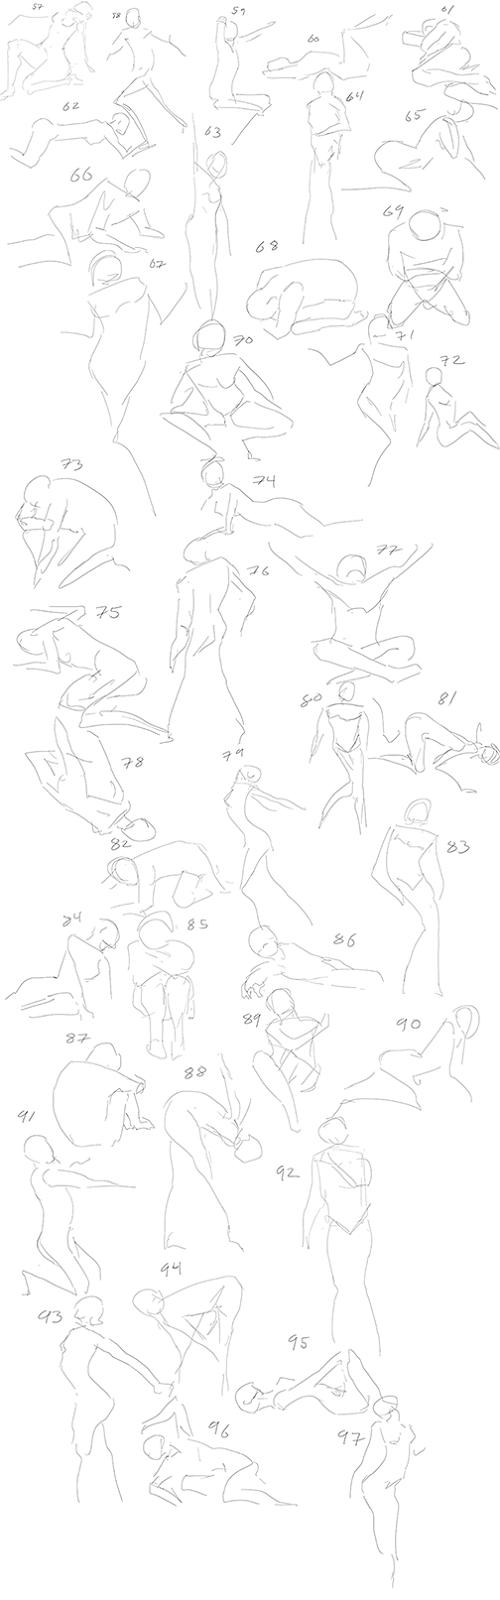 [Image: Gestures_23.png]